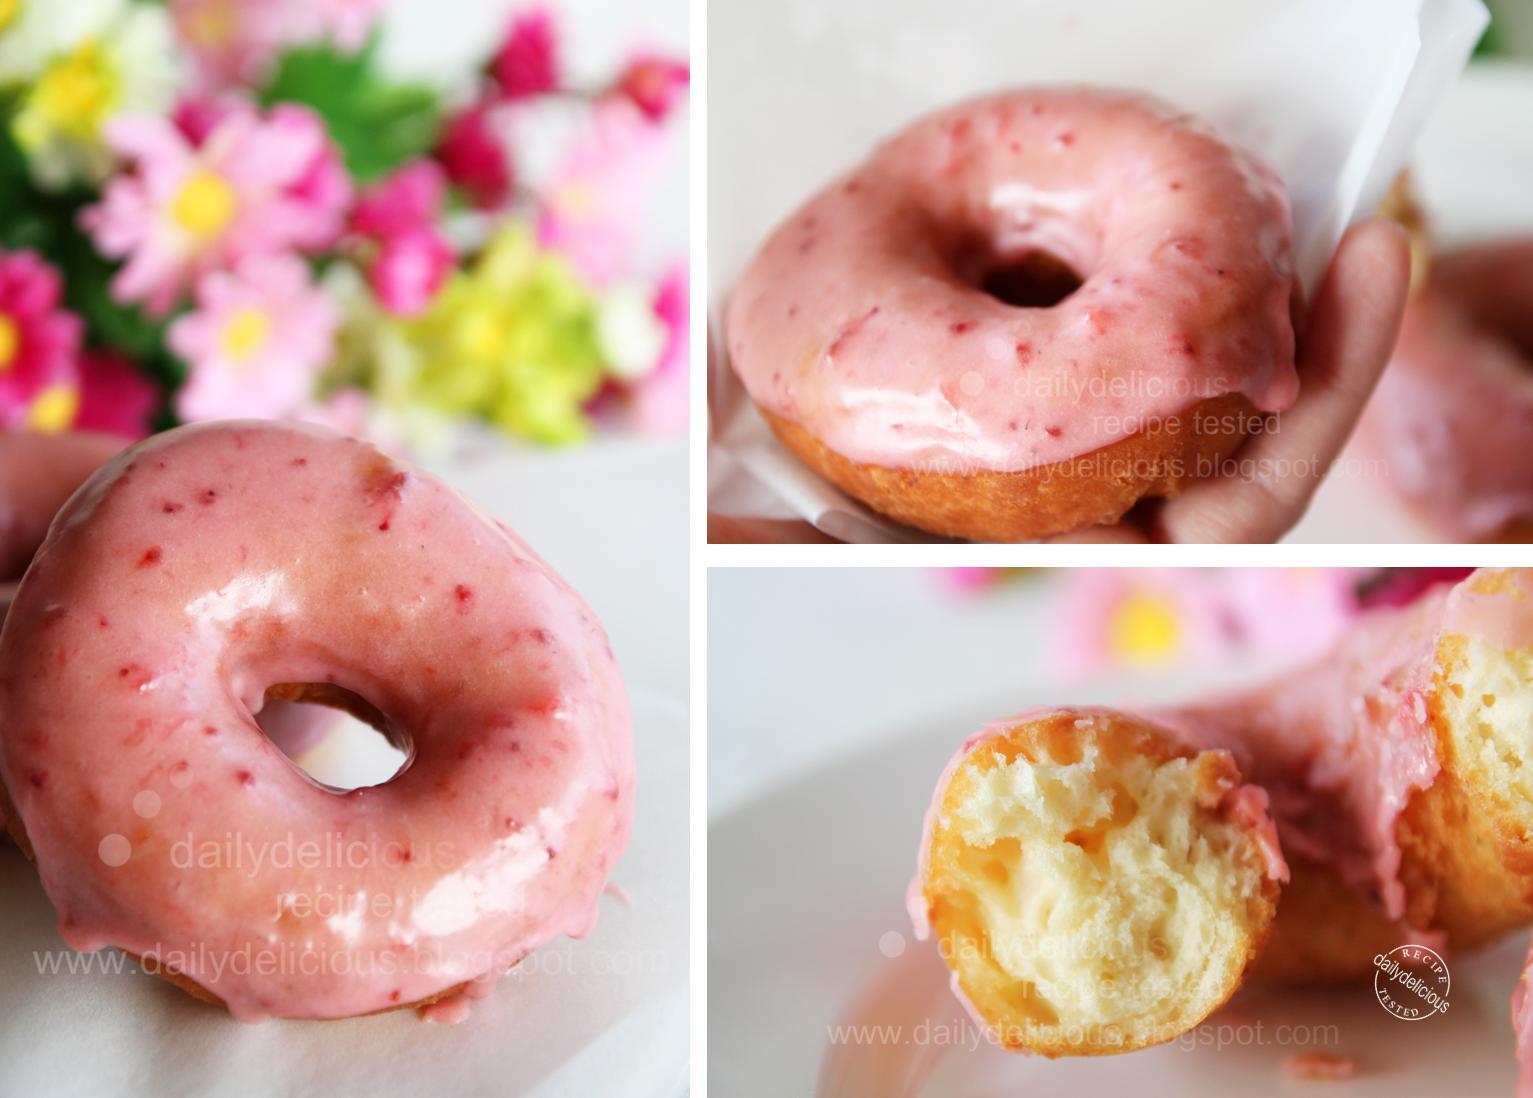 http://4.bp.blogspot.com/_iDAFo9AvKSw/TMfFV4eEsiI/AAAAAAAAGe8/DHL1Wr0GHIU/s1600/Cake+Doughnut_4.jpg